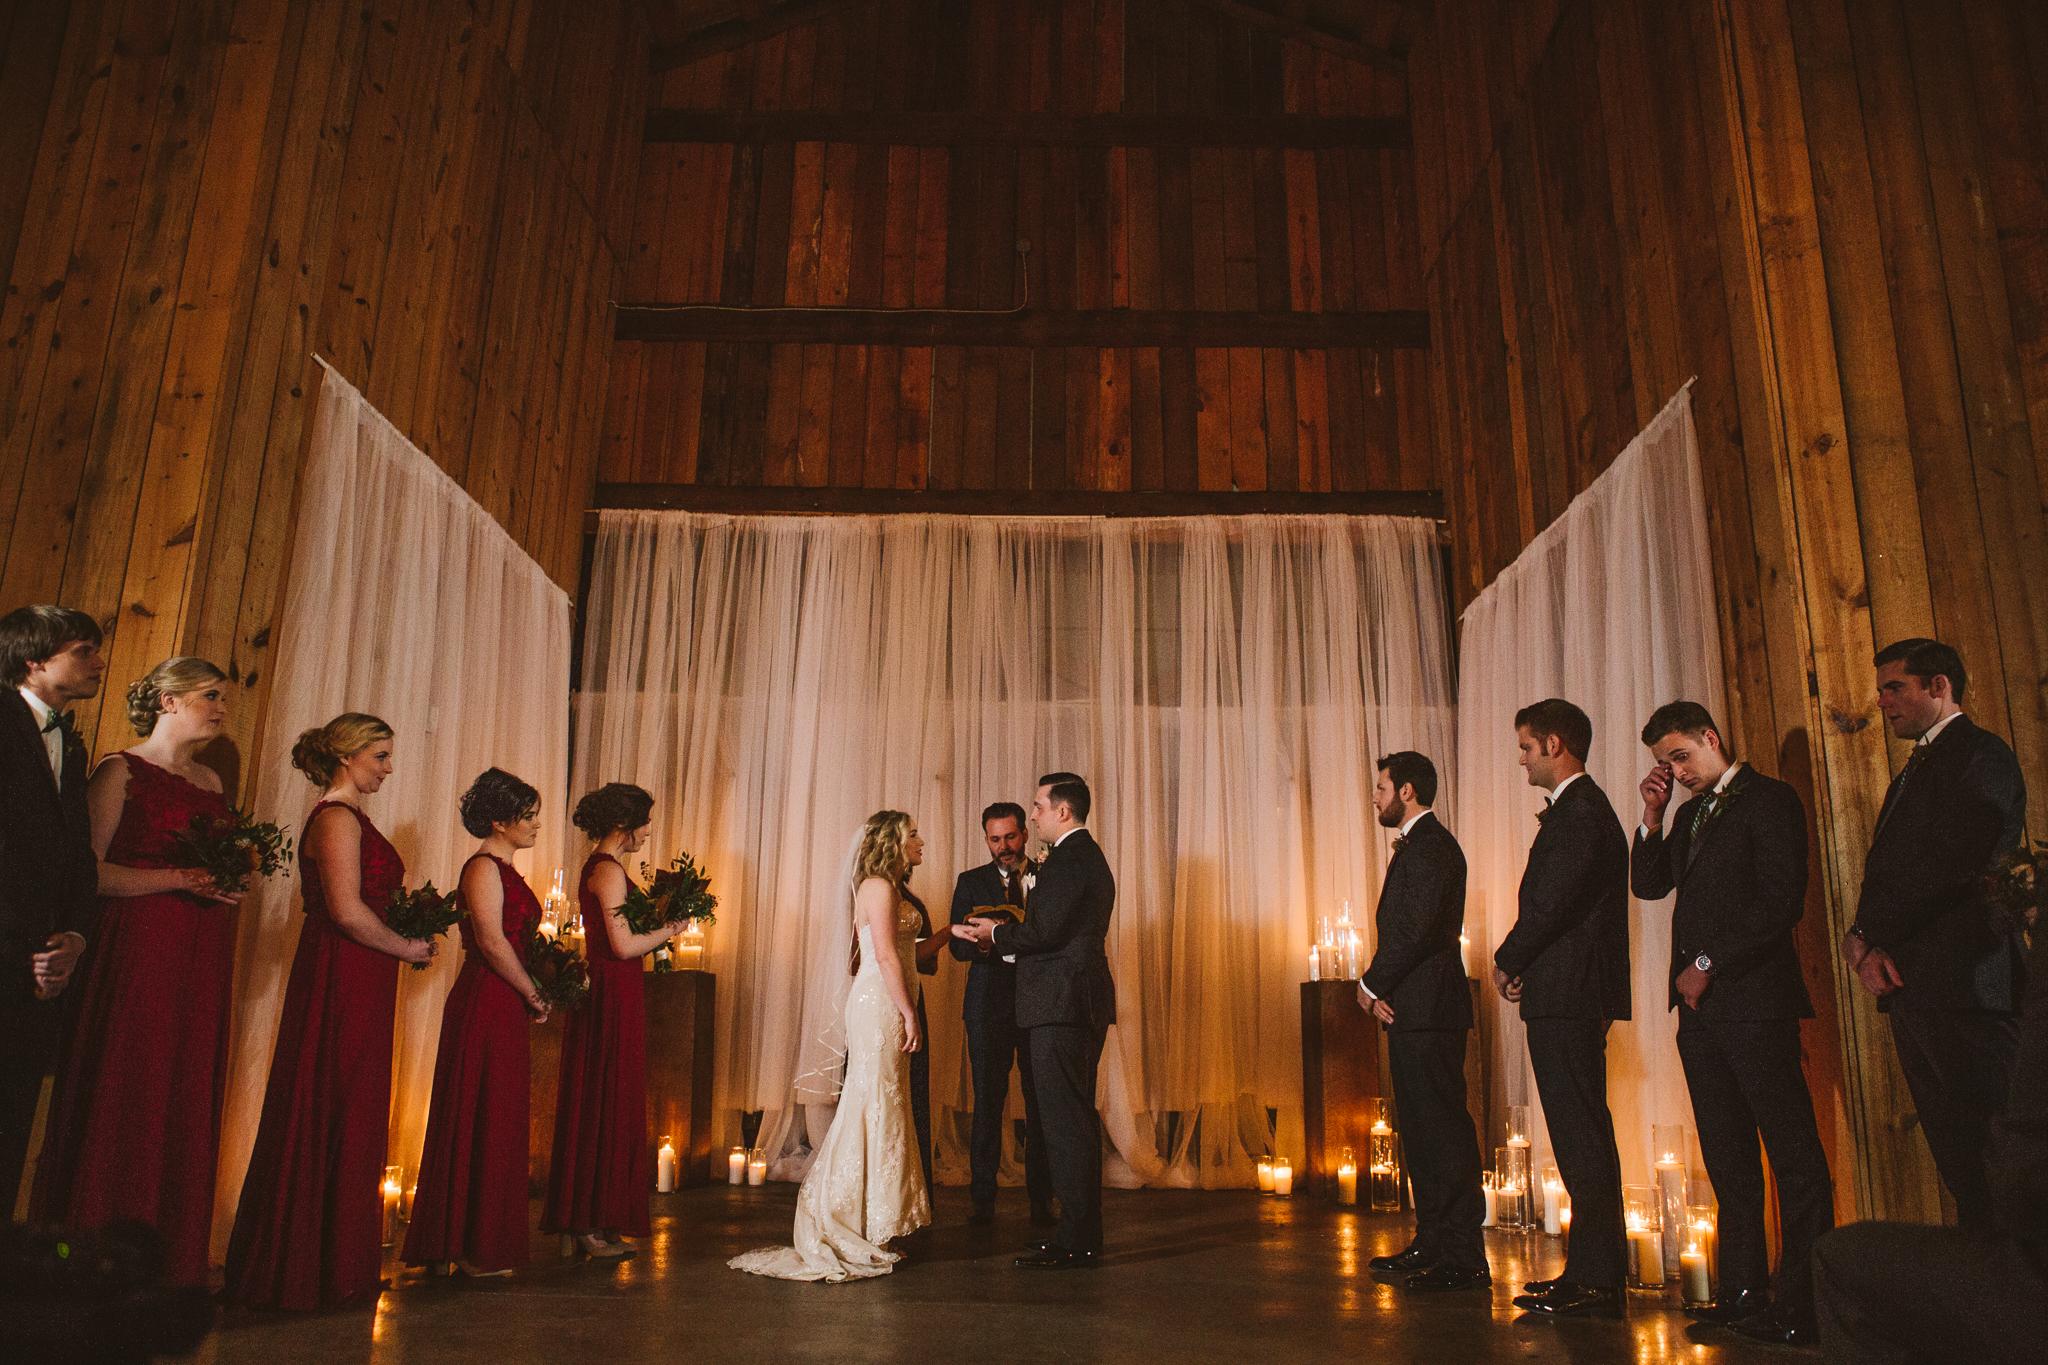 0122 Ariana Jordan Photo - Cameron & Lauren's Wedding at Talon Winery  9150.jpg